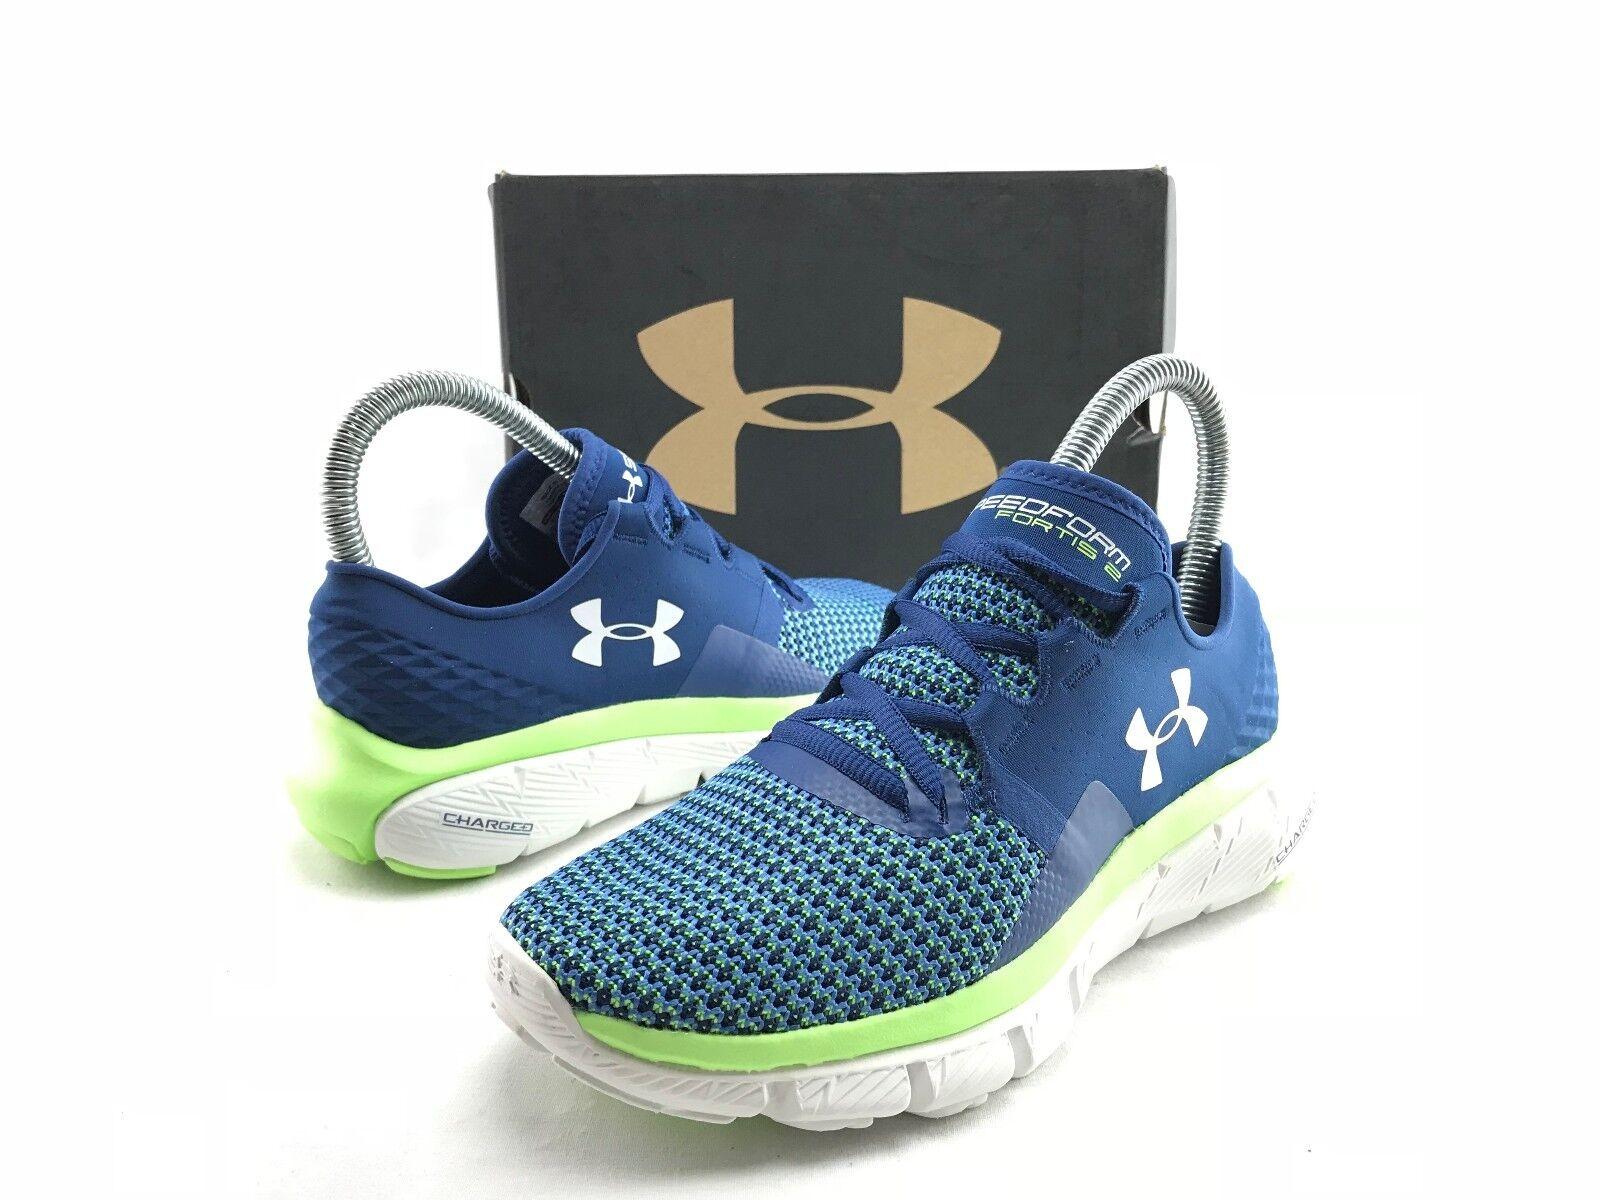 Under Armour Speedform Fortis 2 Damens's Blau Running B869 Schuhes Sneakers US 5 B869 Running 78788c